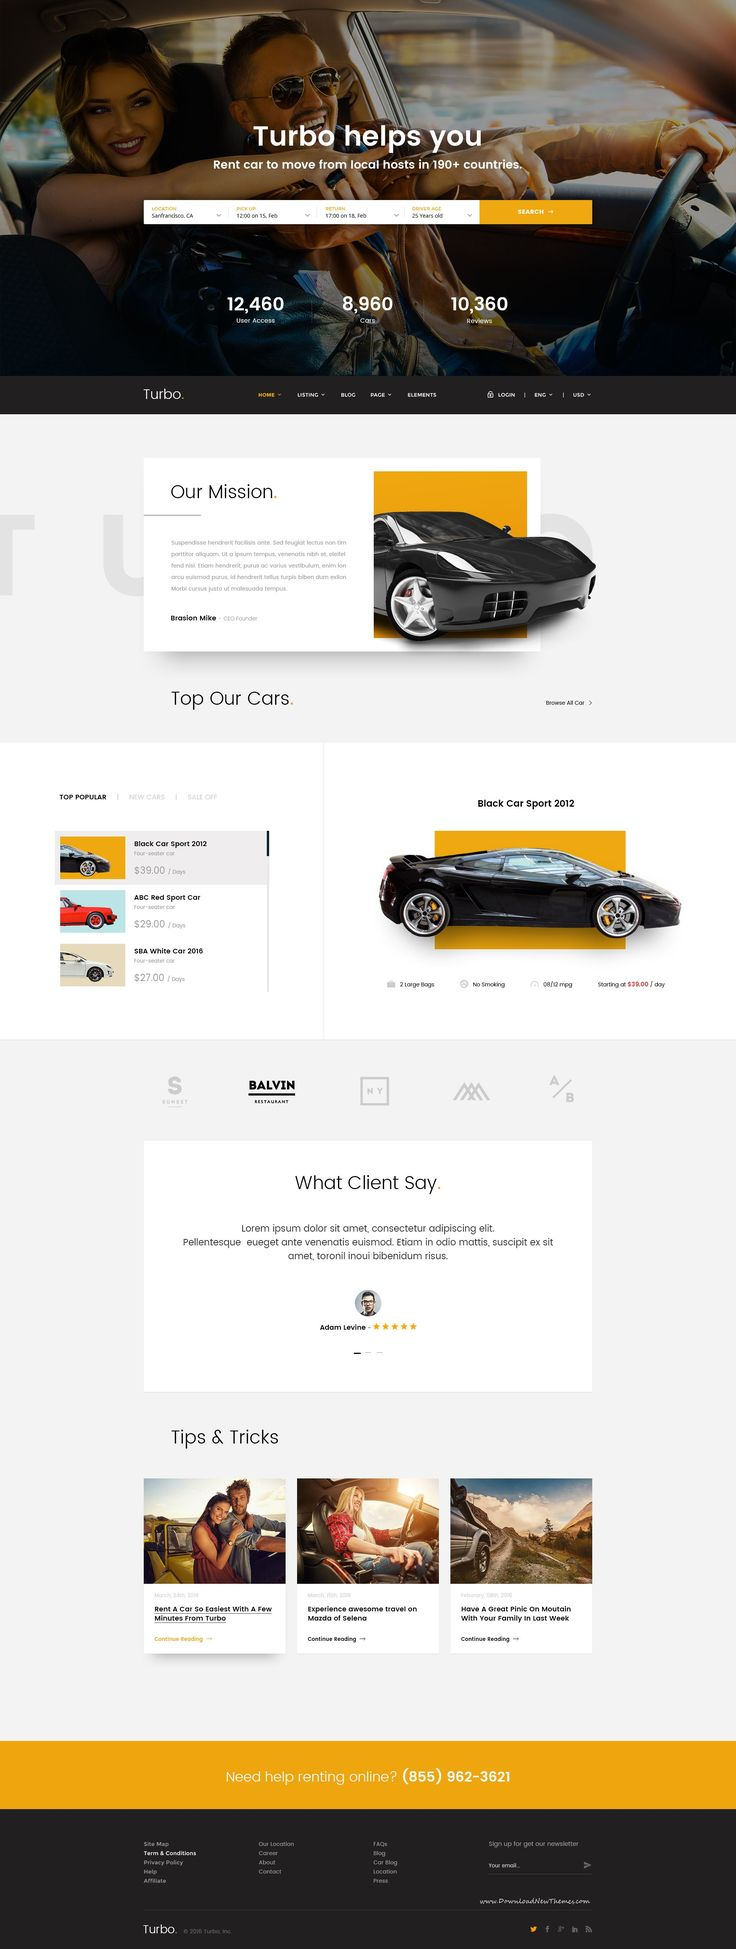 Turbo car rental psd template